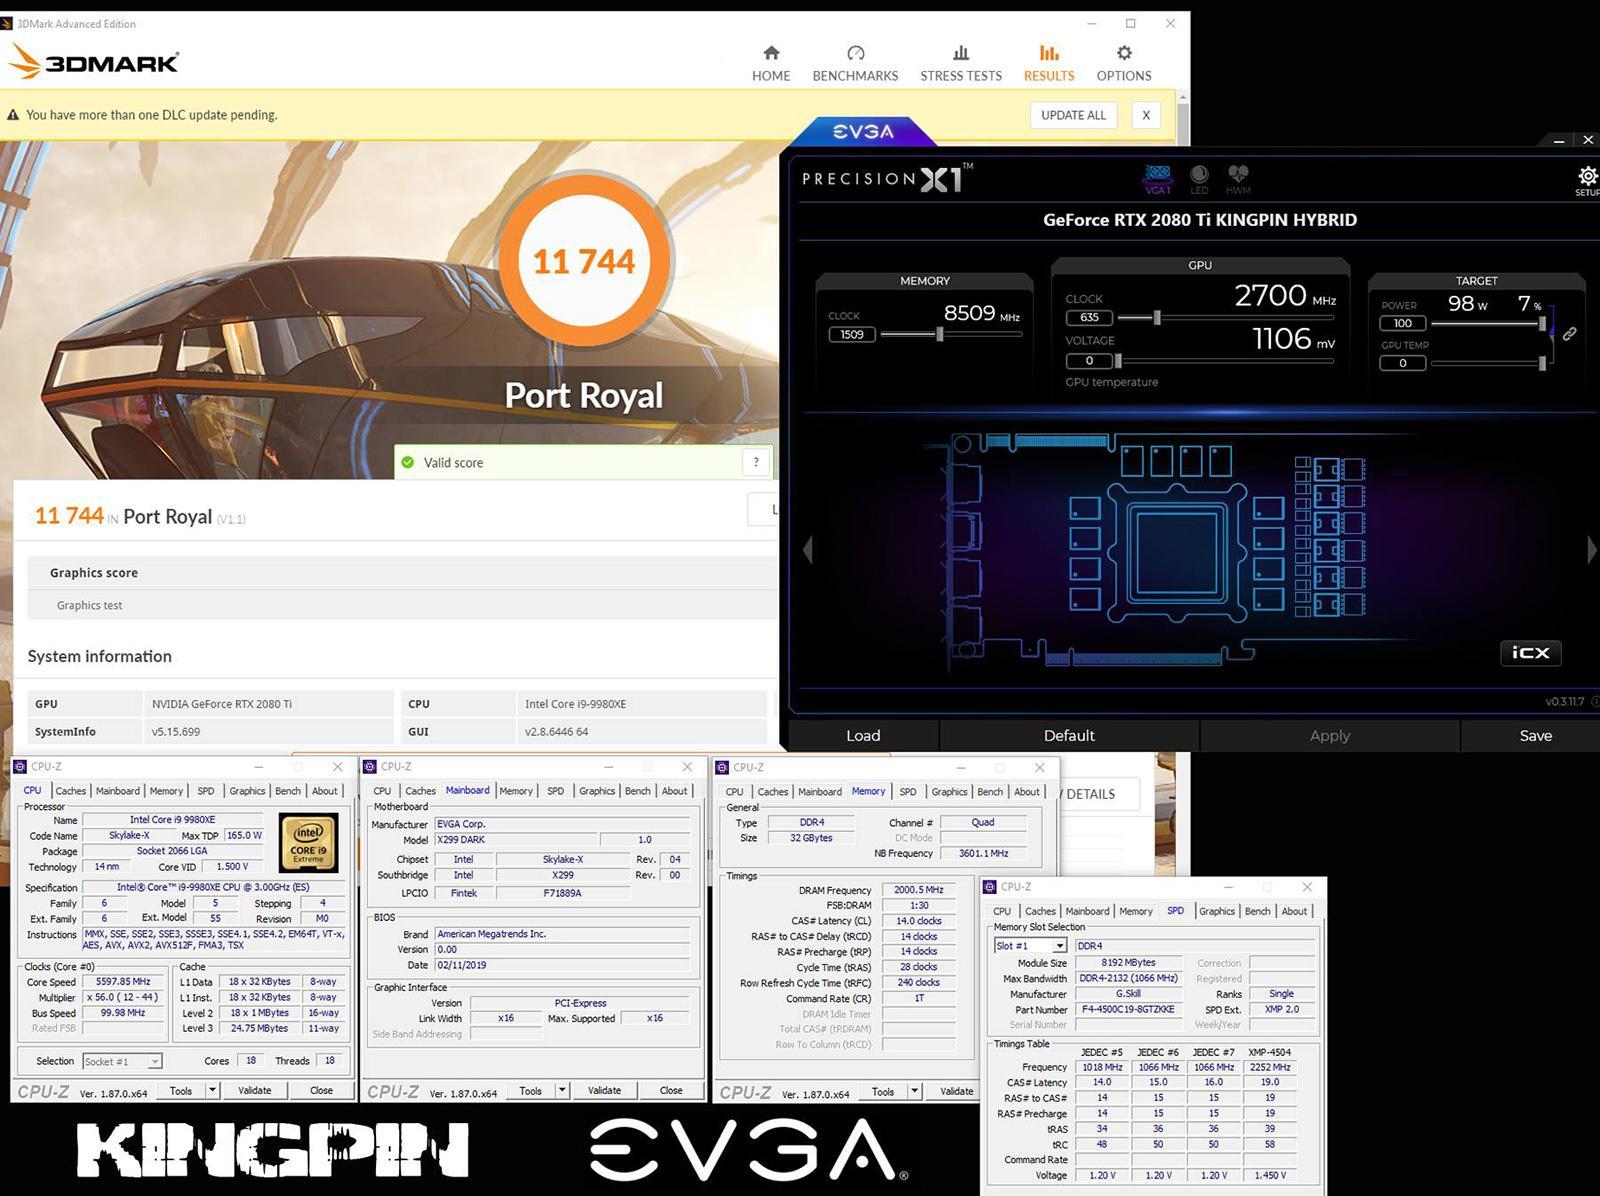 GeForce RTX 2080 Ti разогнана до 2,7 ГГц по ядру. Обновлен мировой рекорд 3DMark Port Royal